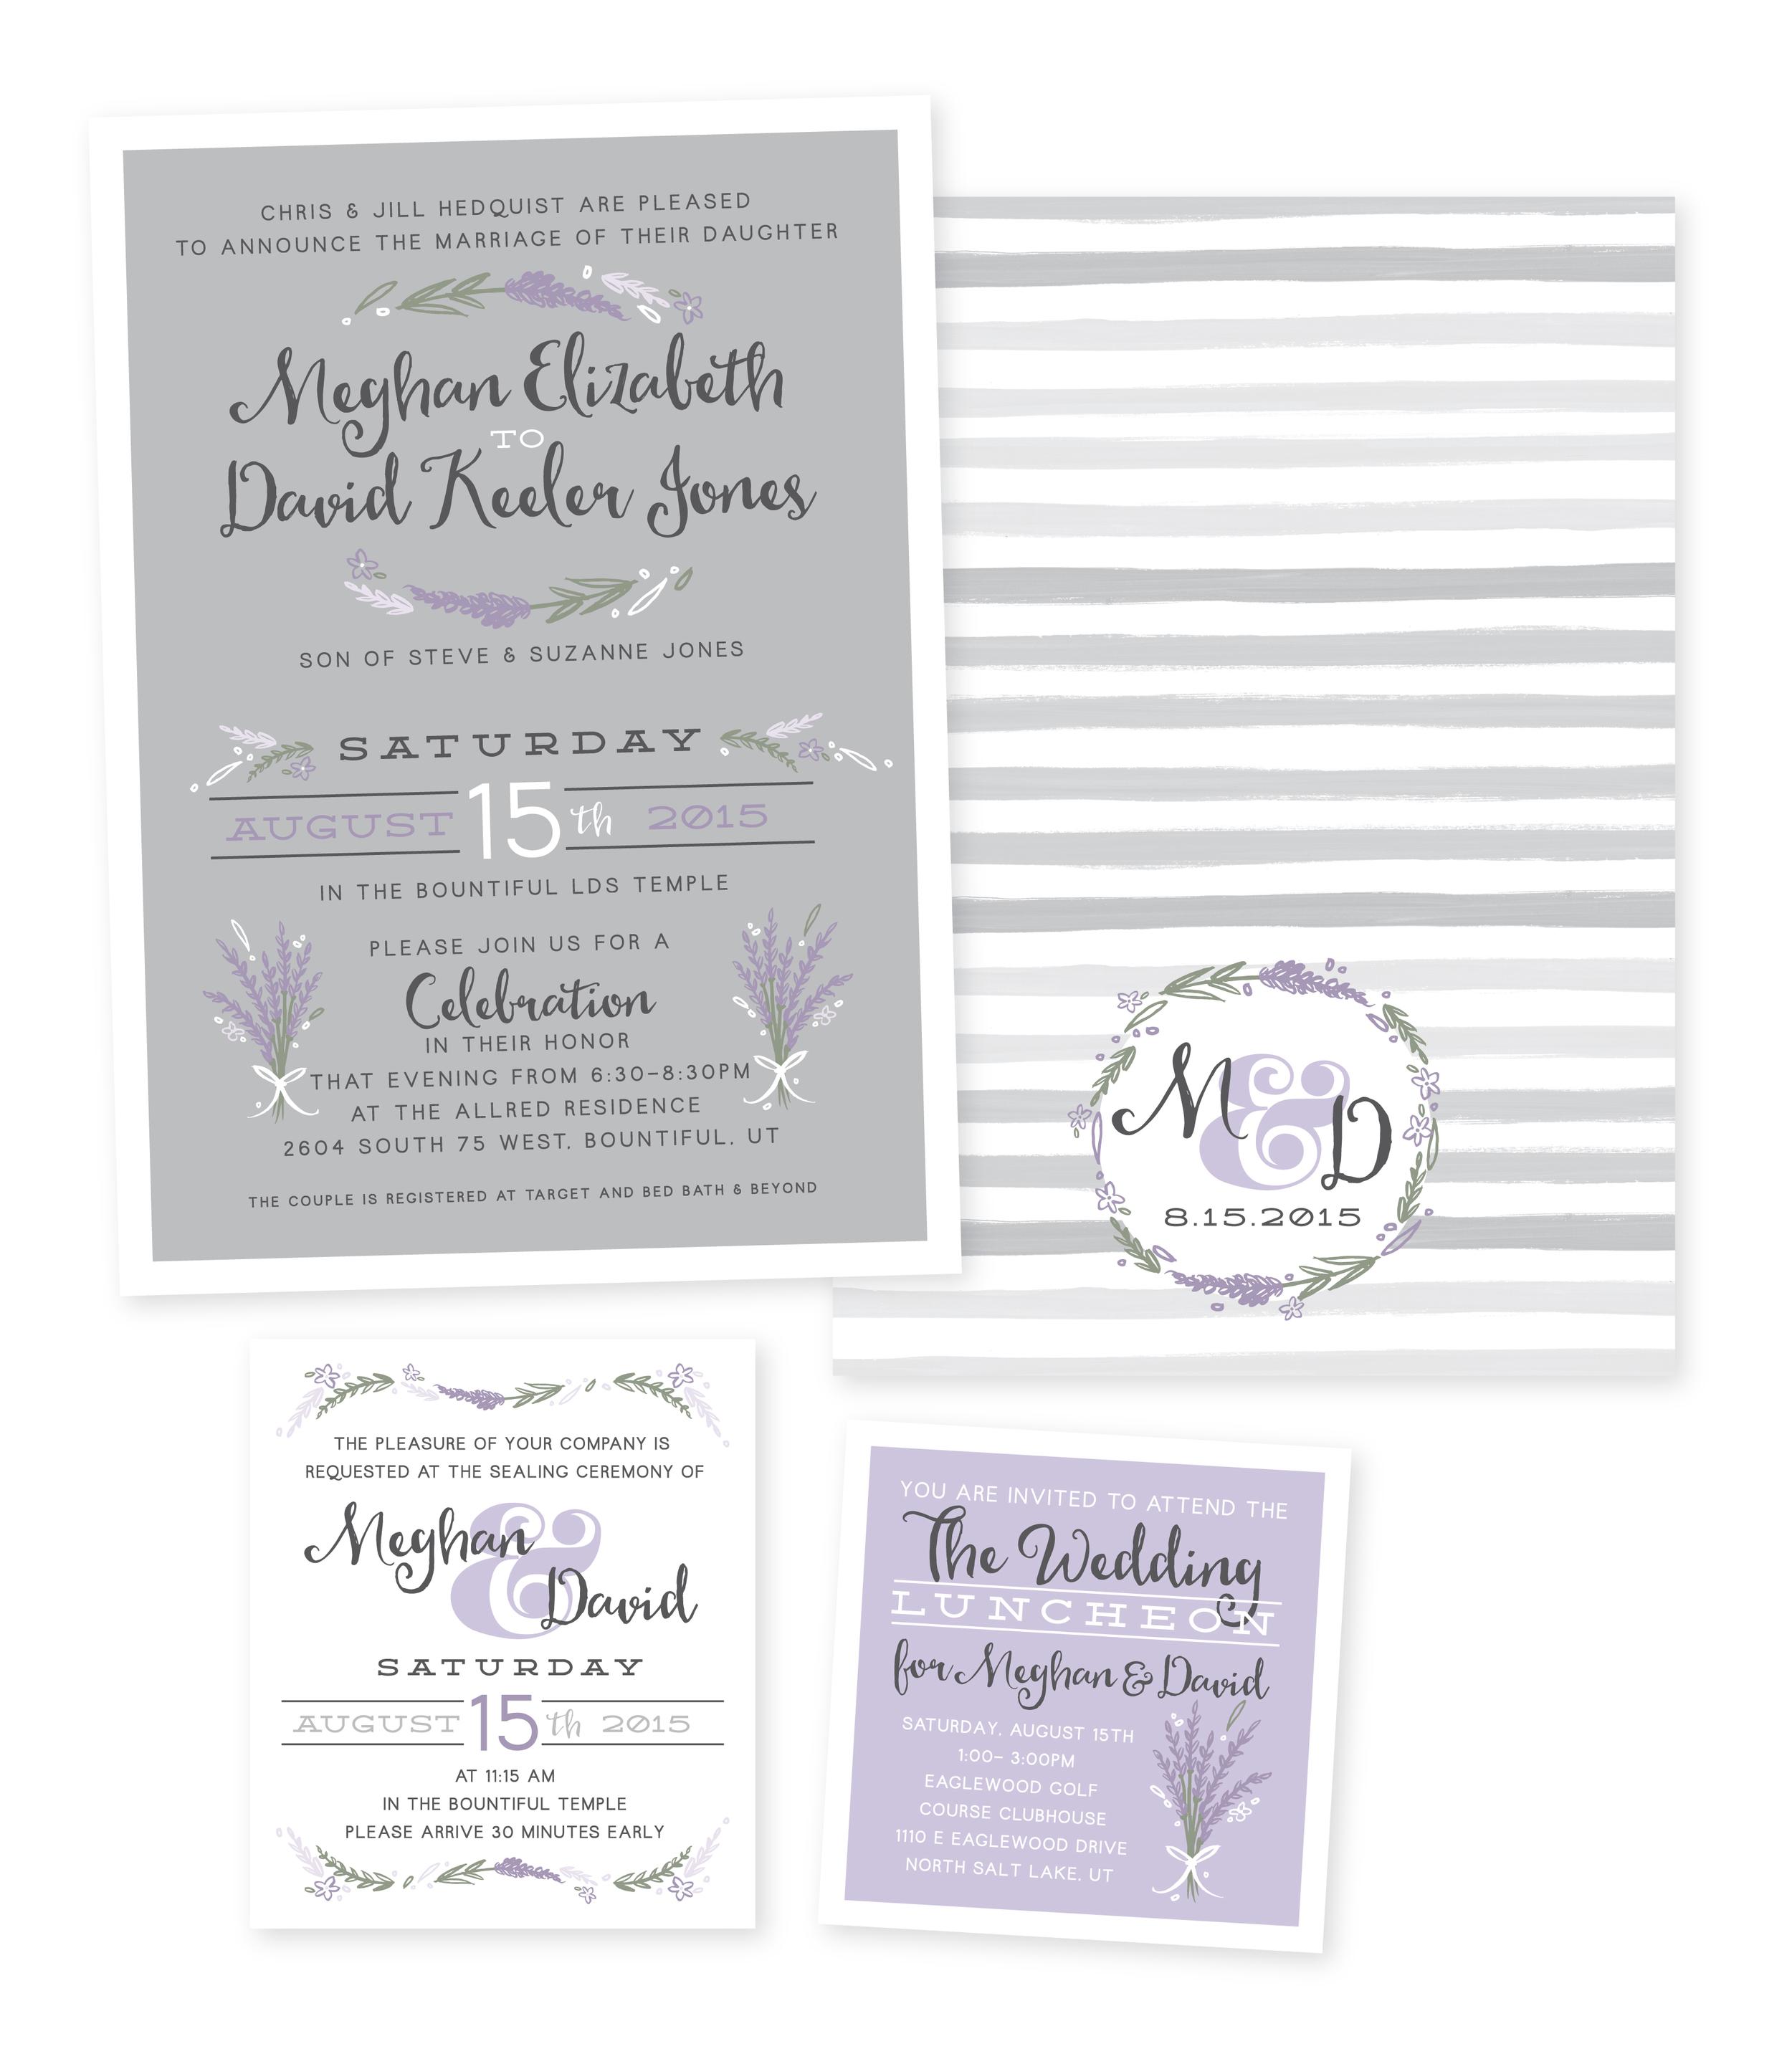 Meghan & David Invite-01.jpg